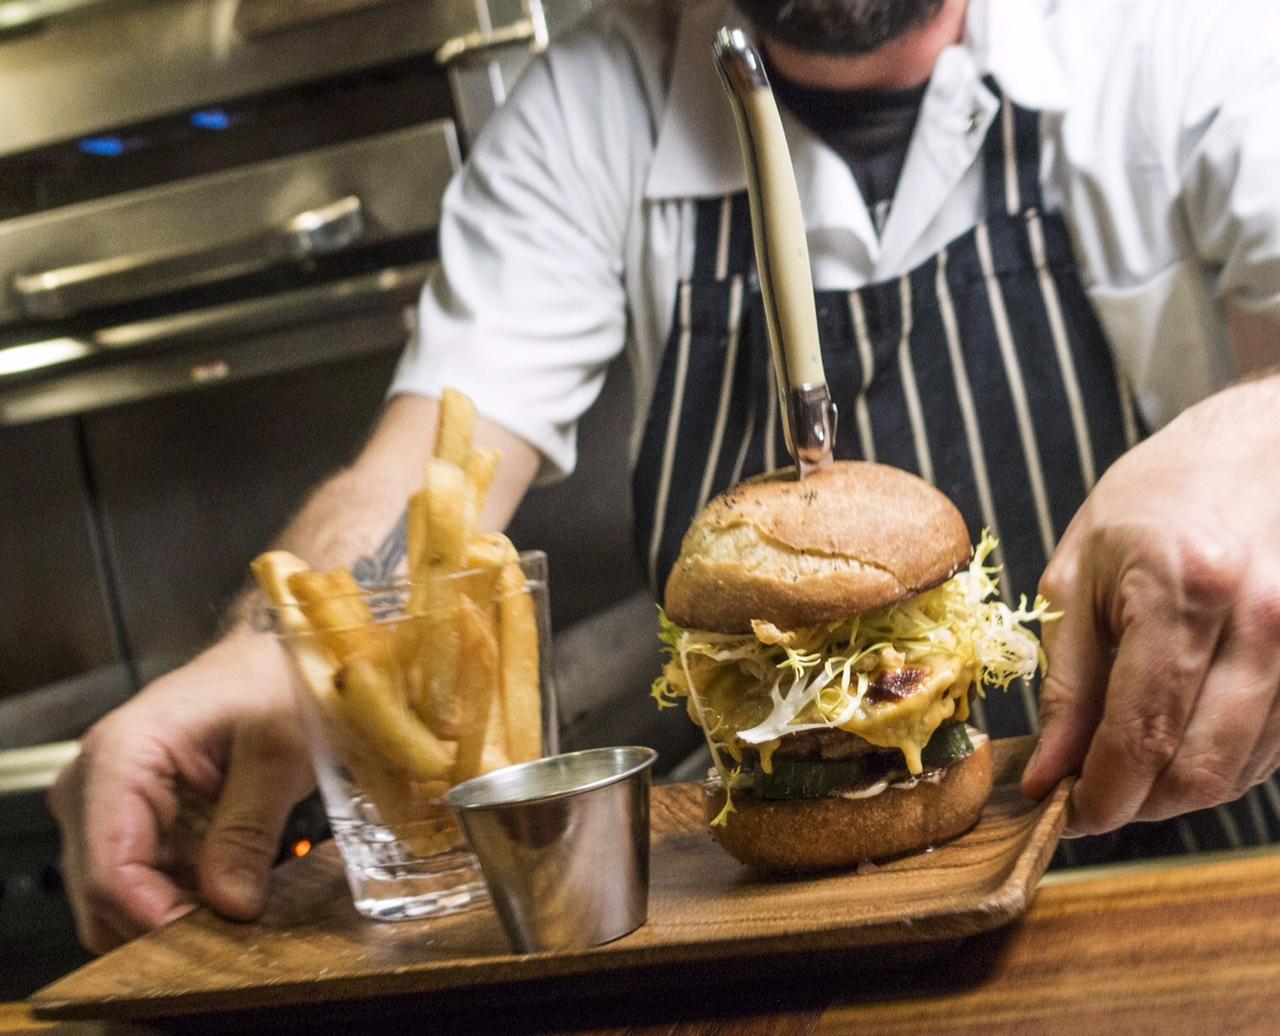 The new Huxley burger.